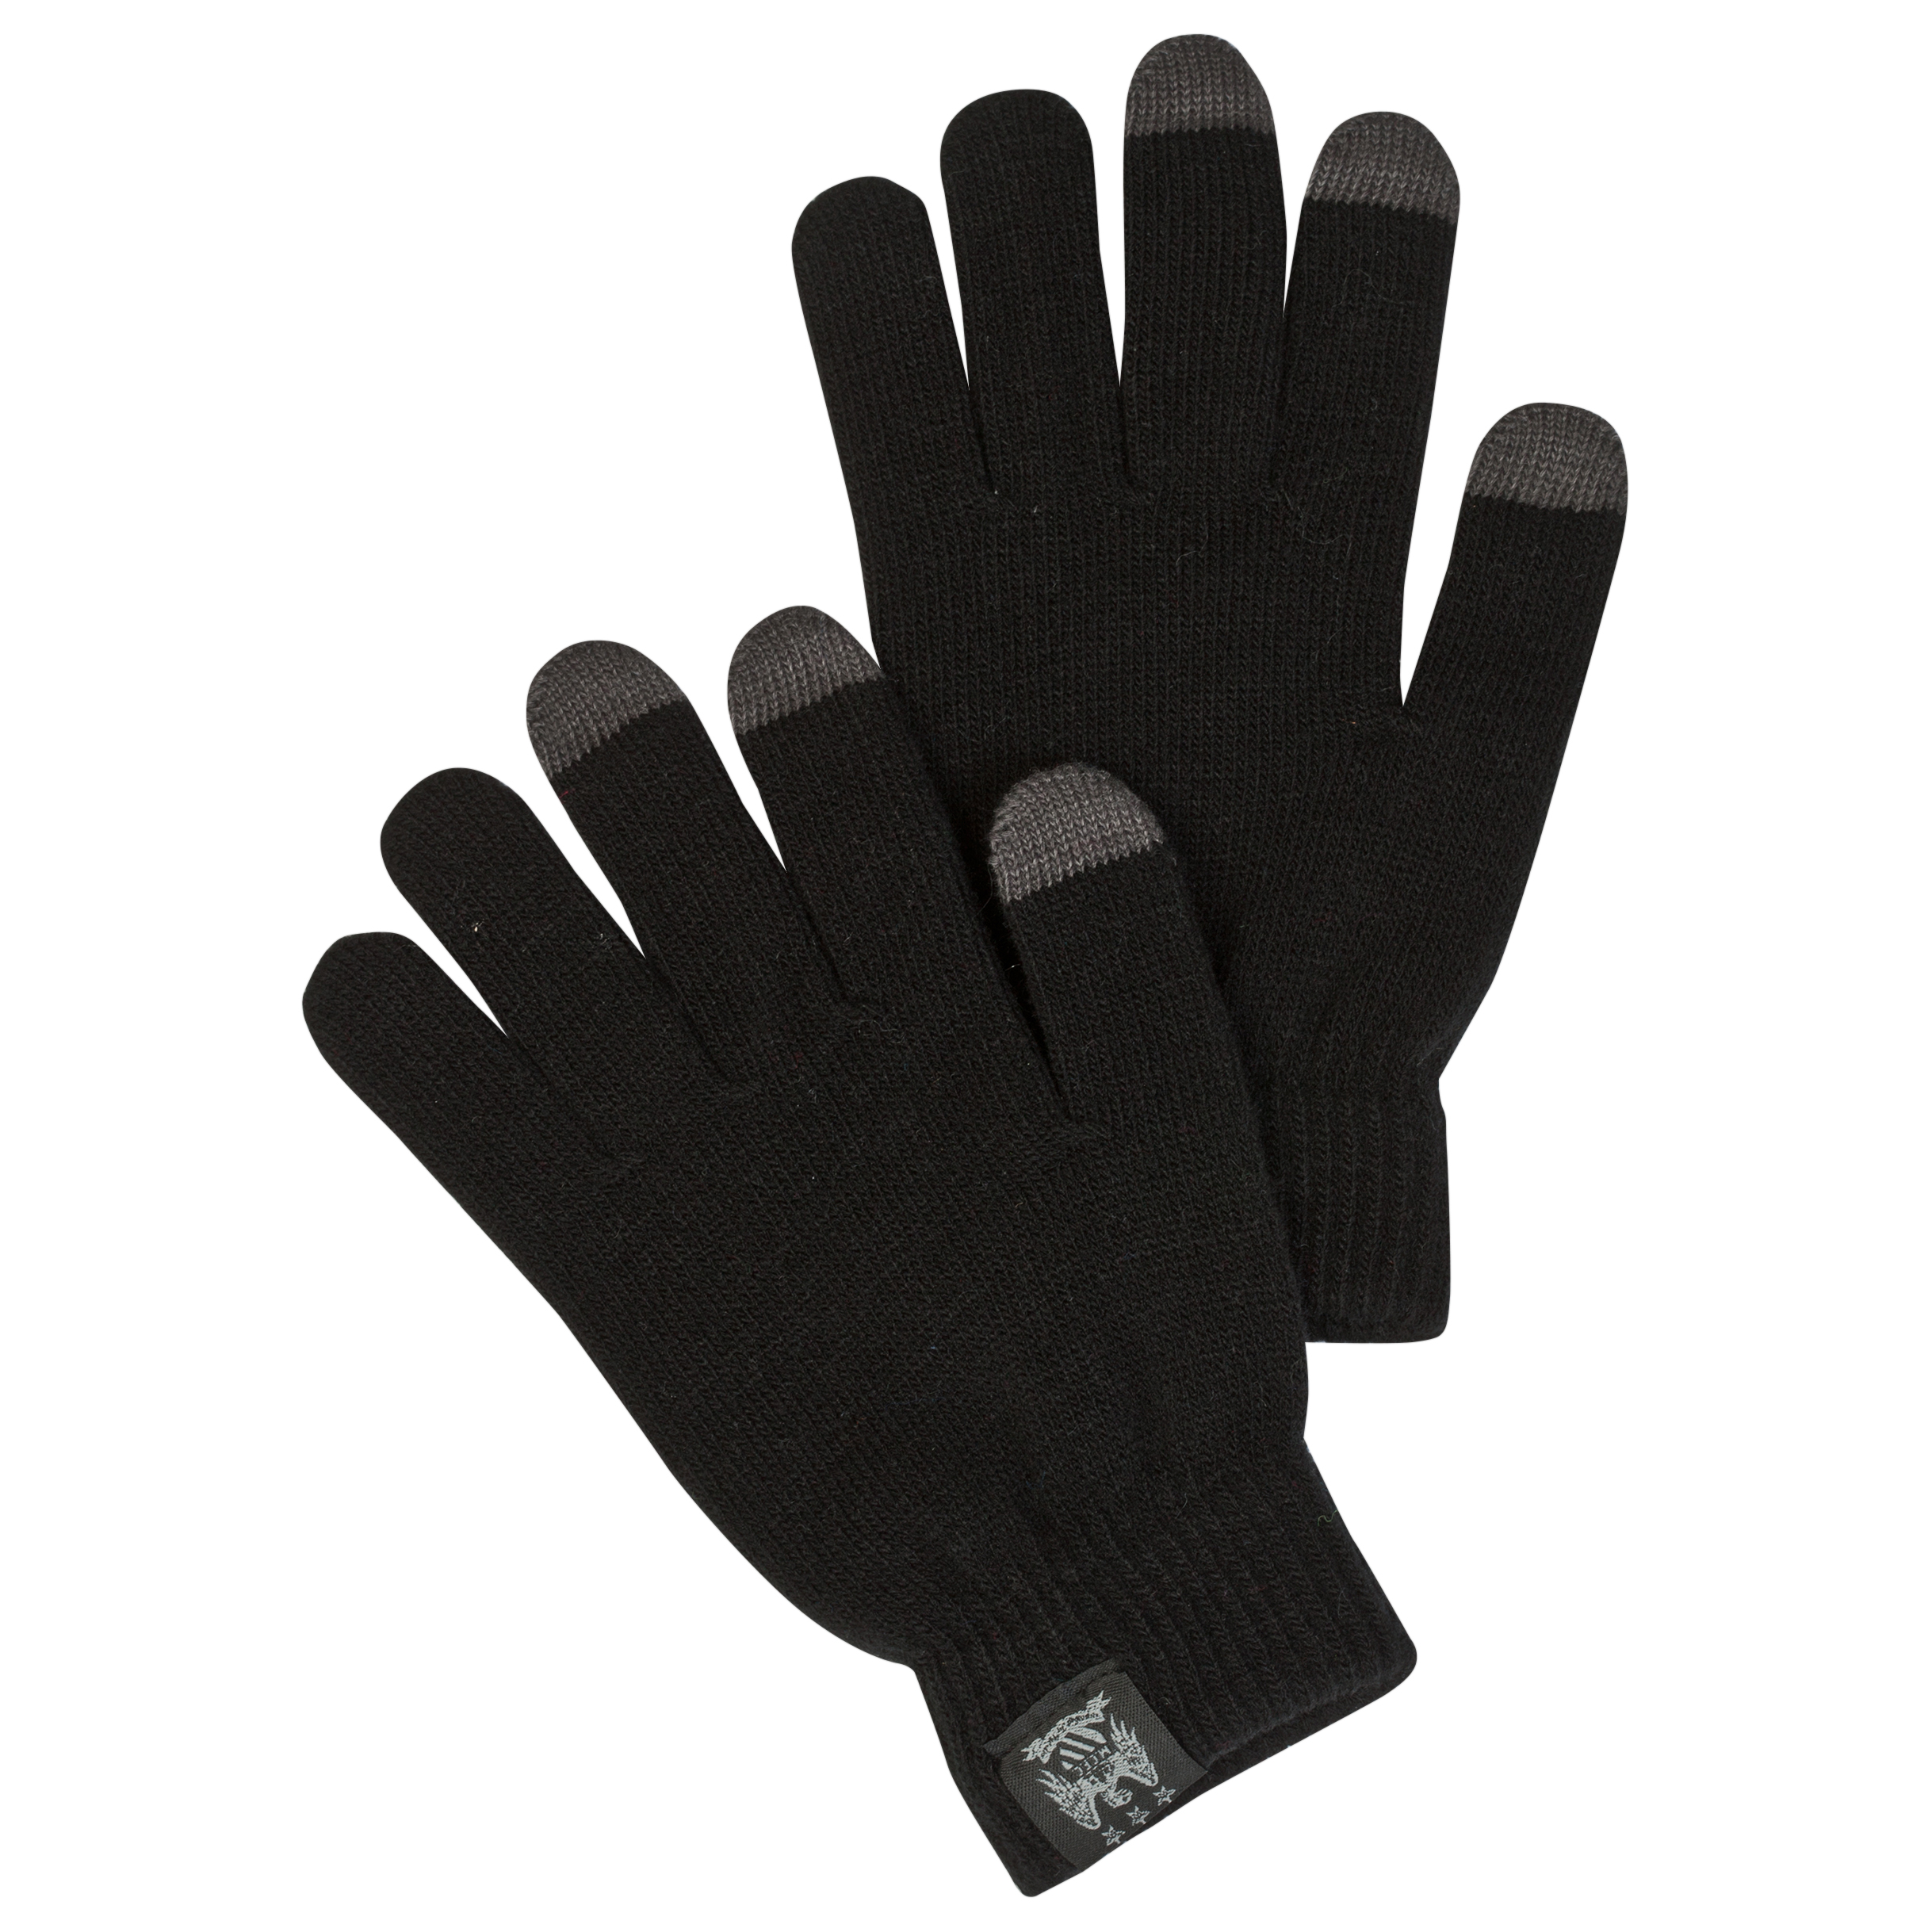 Manchester City Touchscreen Gloves - Black - Adult